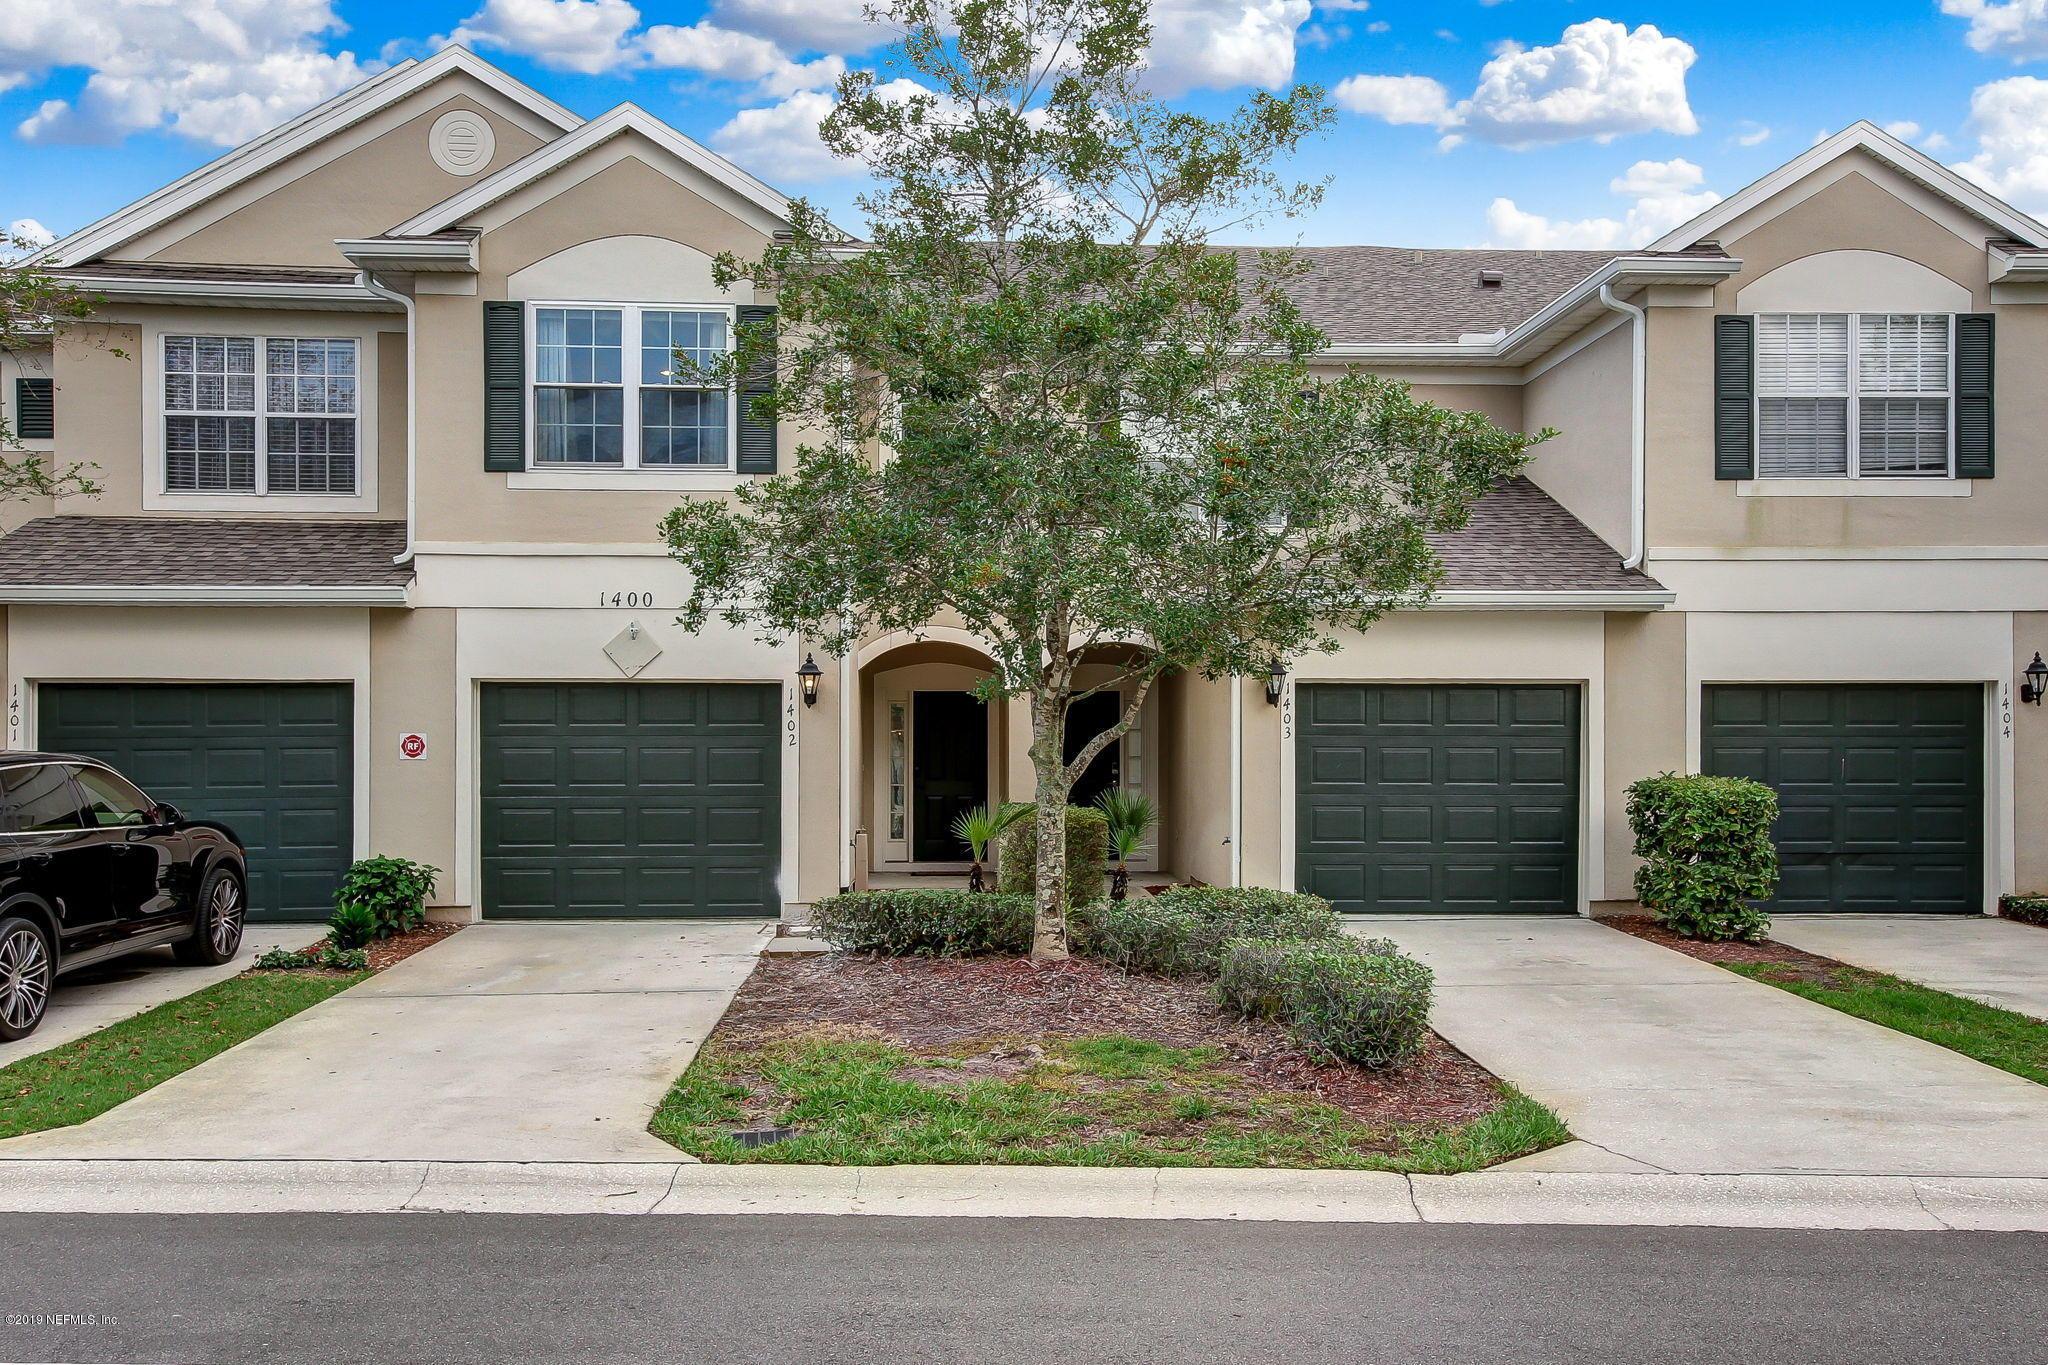 7990 BAYMEADOWS, JACKSONVILLE, FLORIDA 32256, 3 Bedrooms Bedrooms, ,2 BathroomsBathrooms,Residential - condos/townhomes,For sale,BAYMEADOWS,1022881